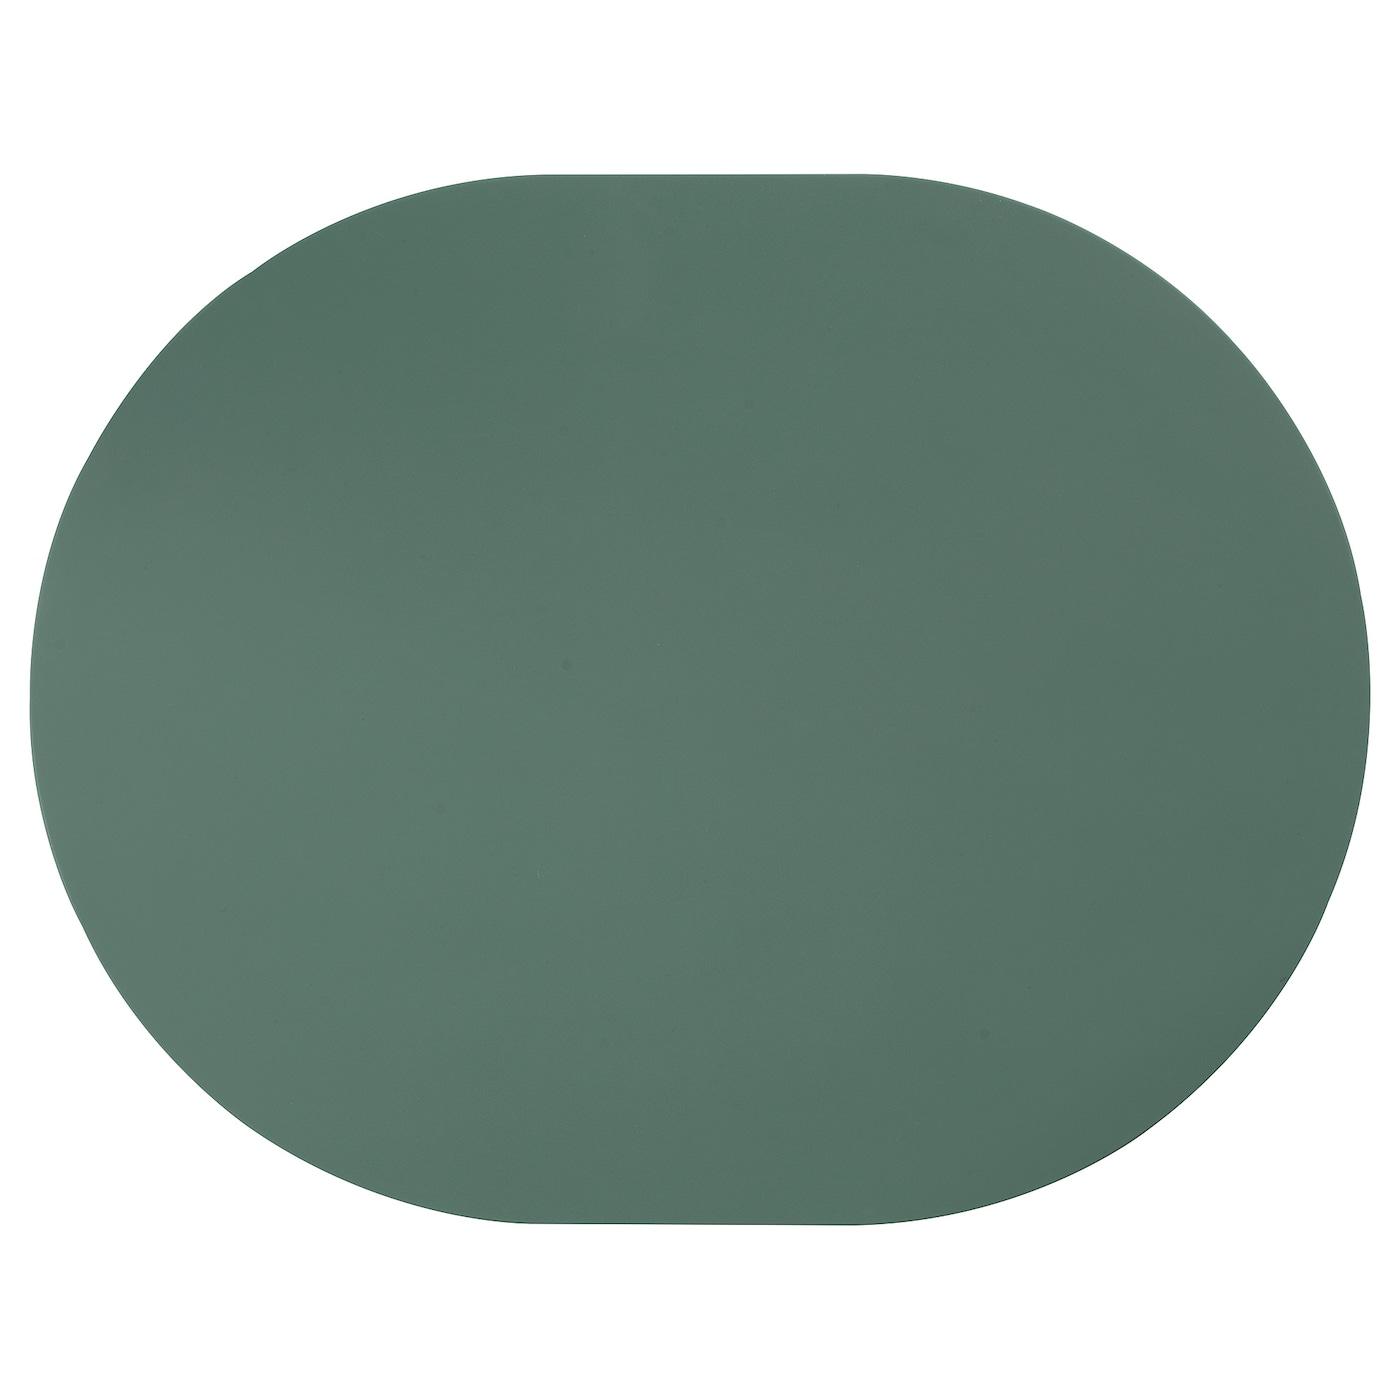 Omt nksam mantel individual antideslizante verde 45 x 35 - Antideslizante alfombras ikea ...